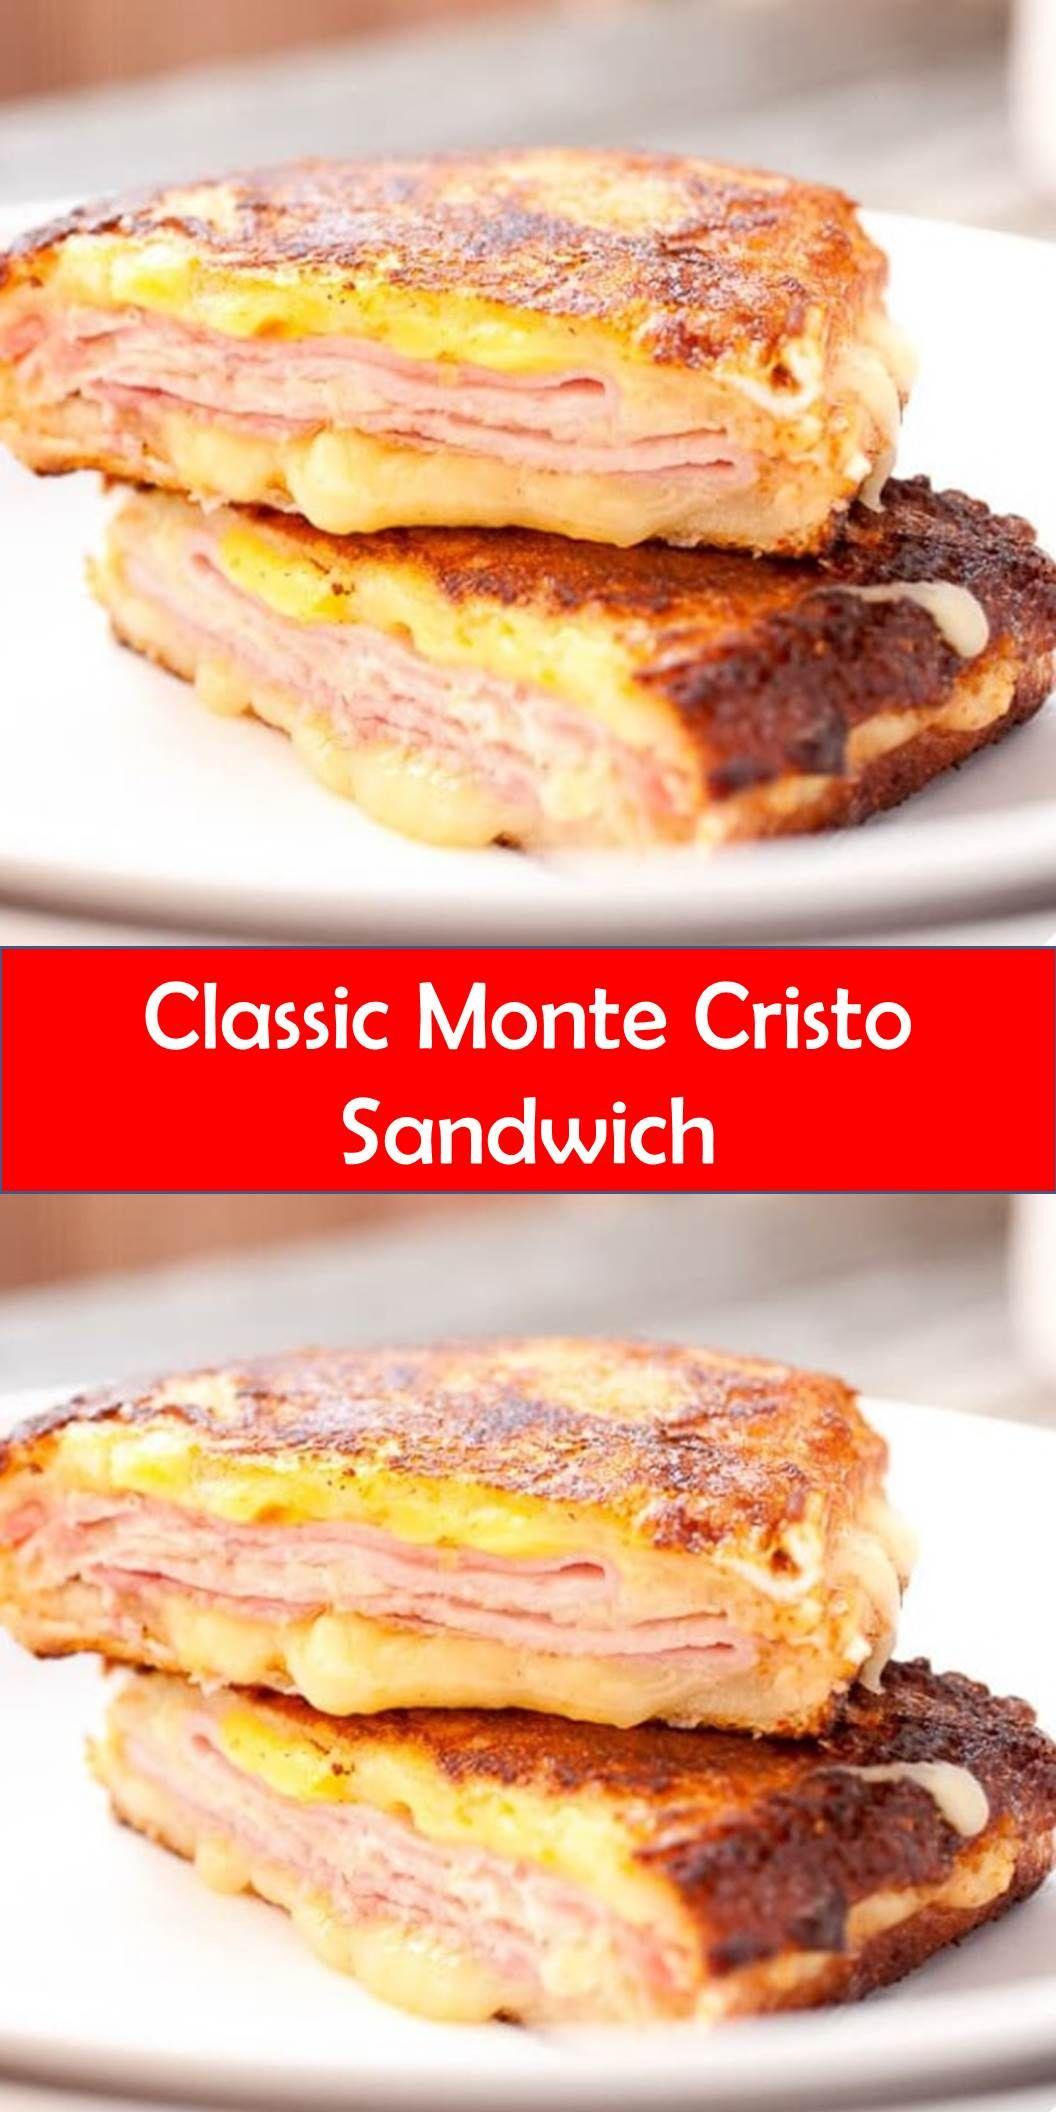 #Yummy #Classic #Monte #Cristo #Sandwich  #montecristosandwich